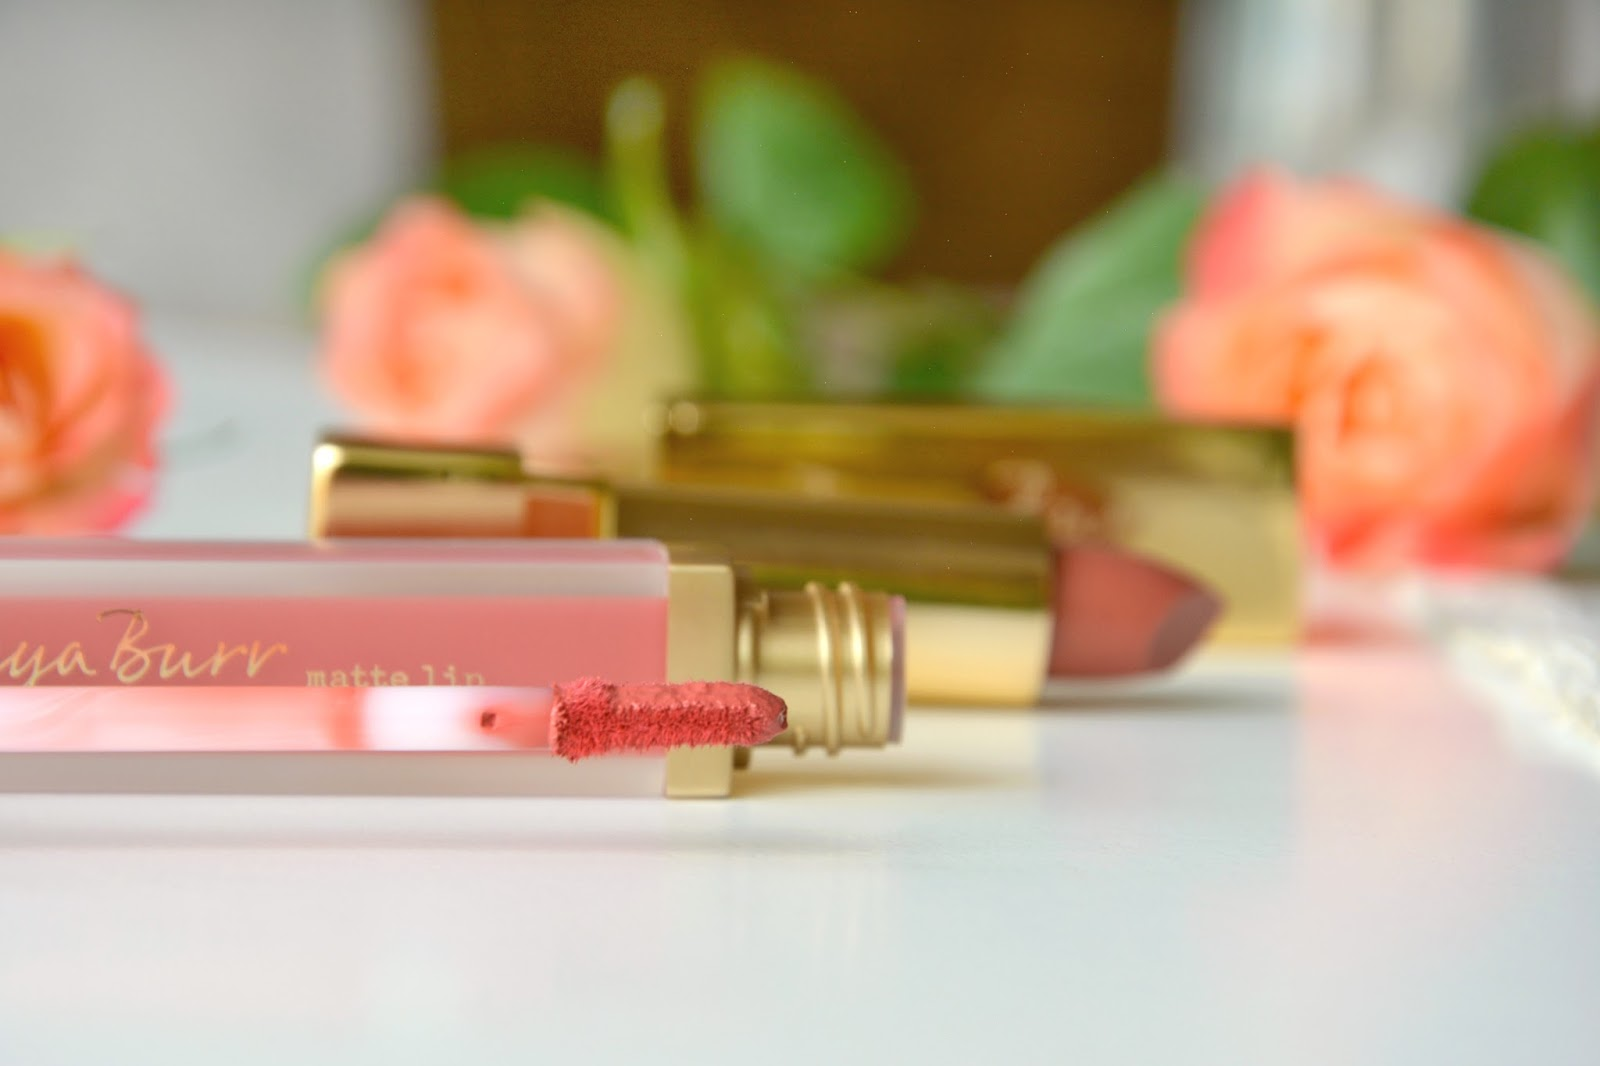 Tanya Burr Cosmetics Lipstick Pink Cocoa; Tanya Burr Cosmetics Soft Luxe Lip Gloss Martha Moo